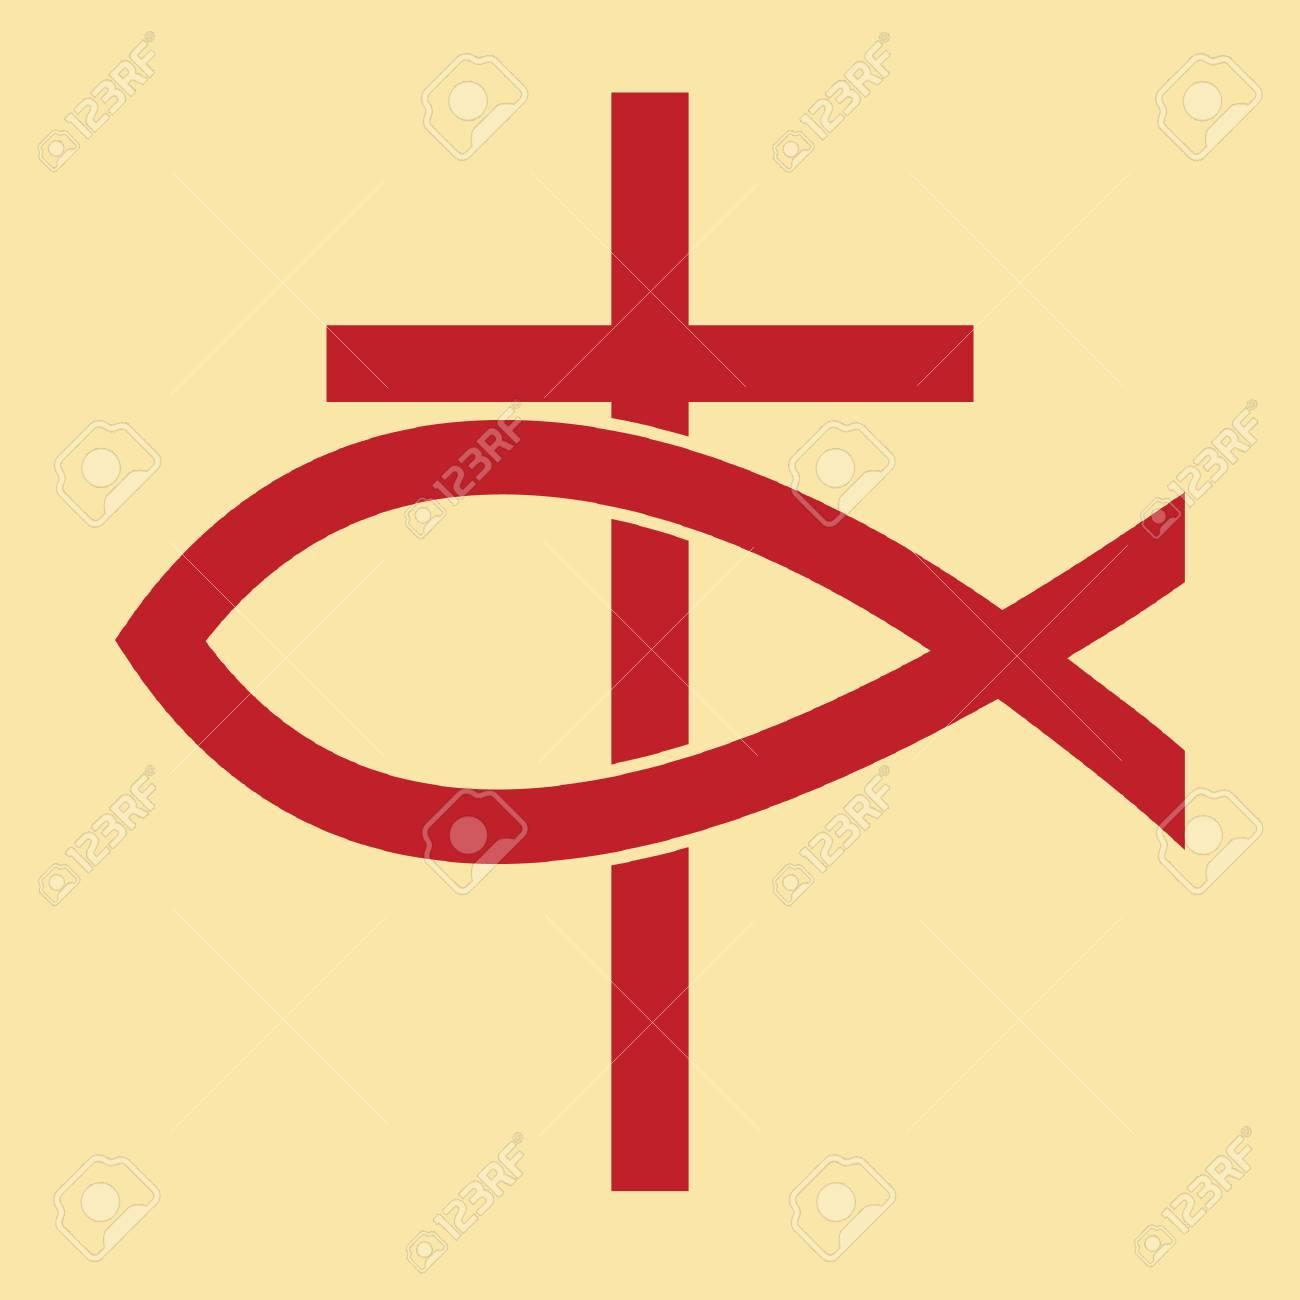 cross and fish - 106671792